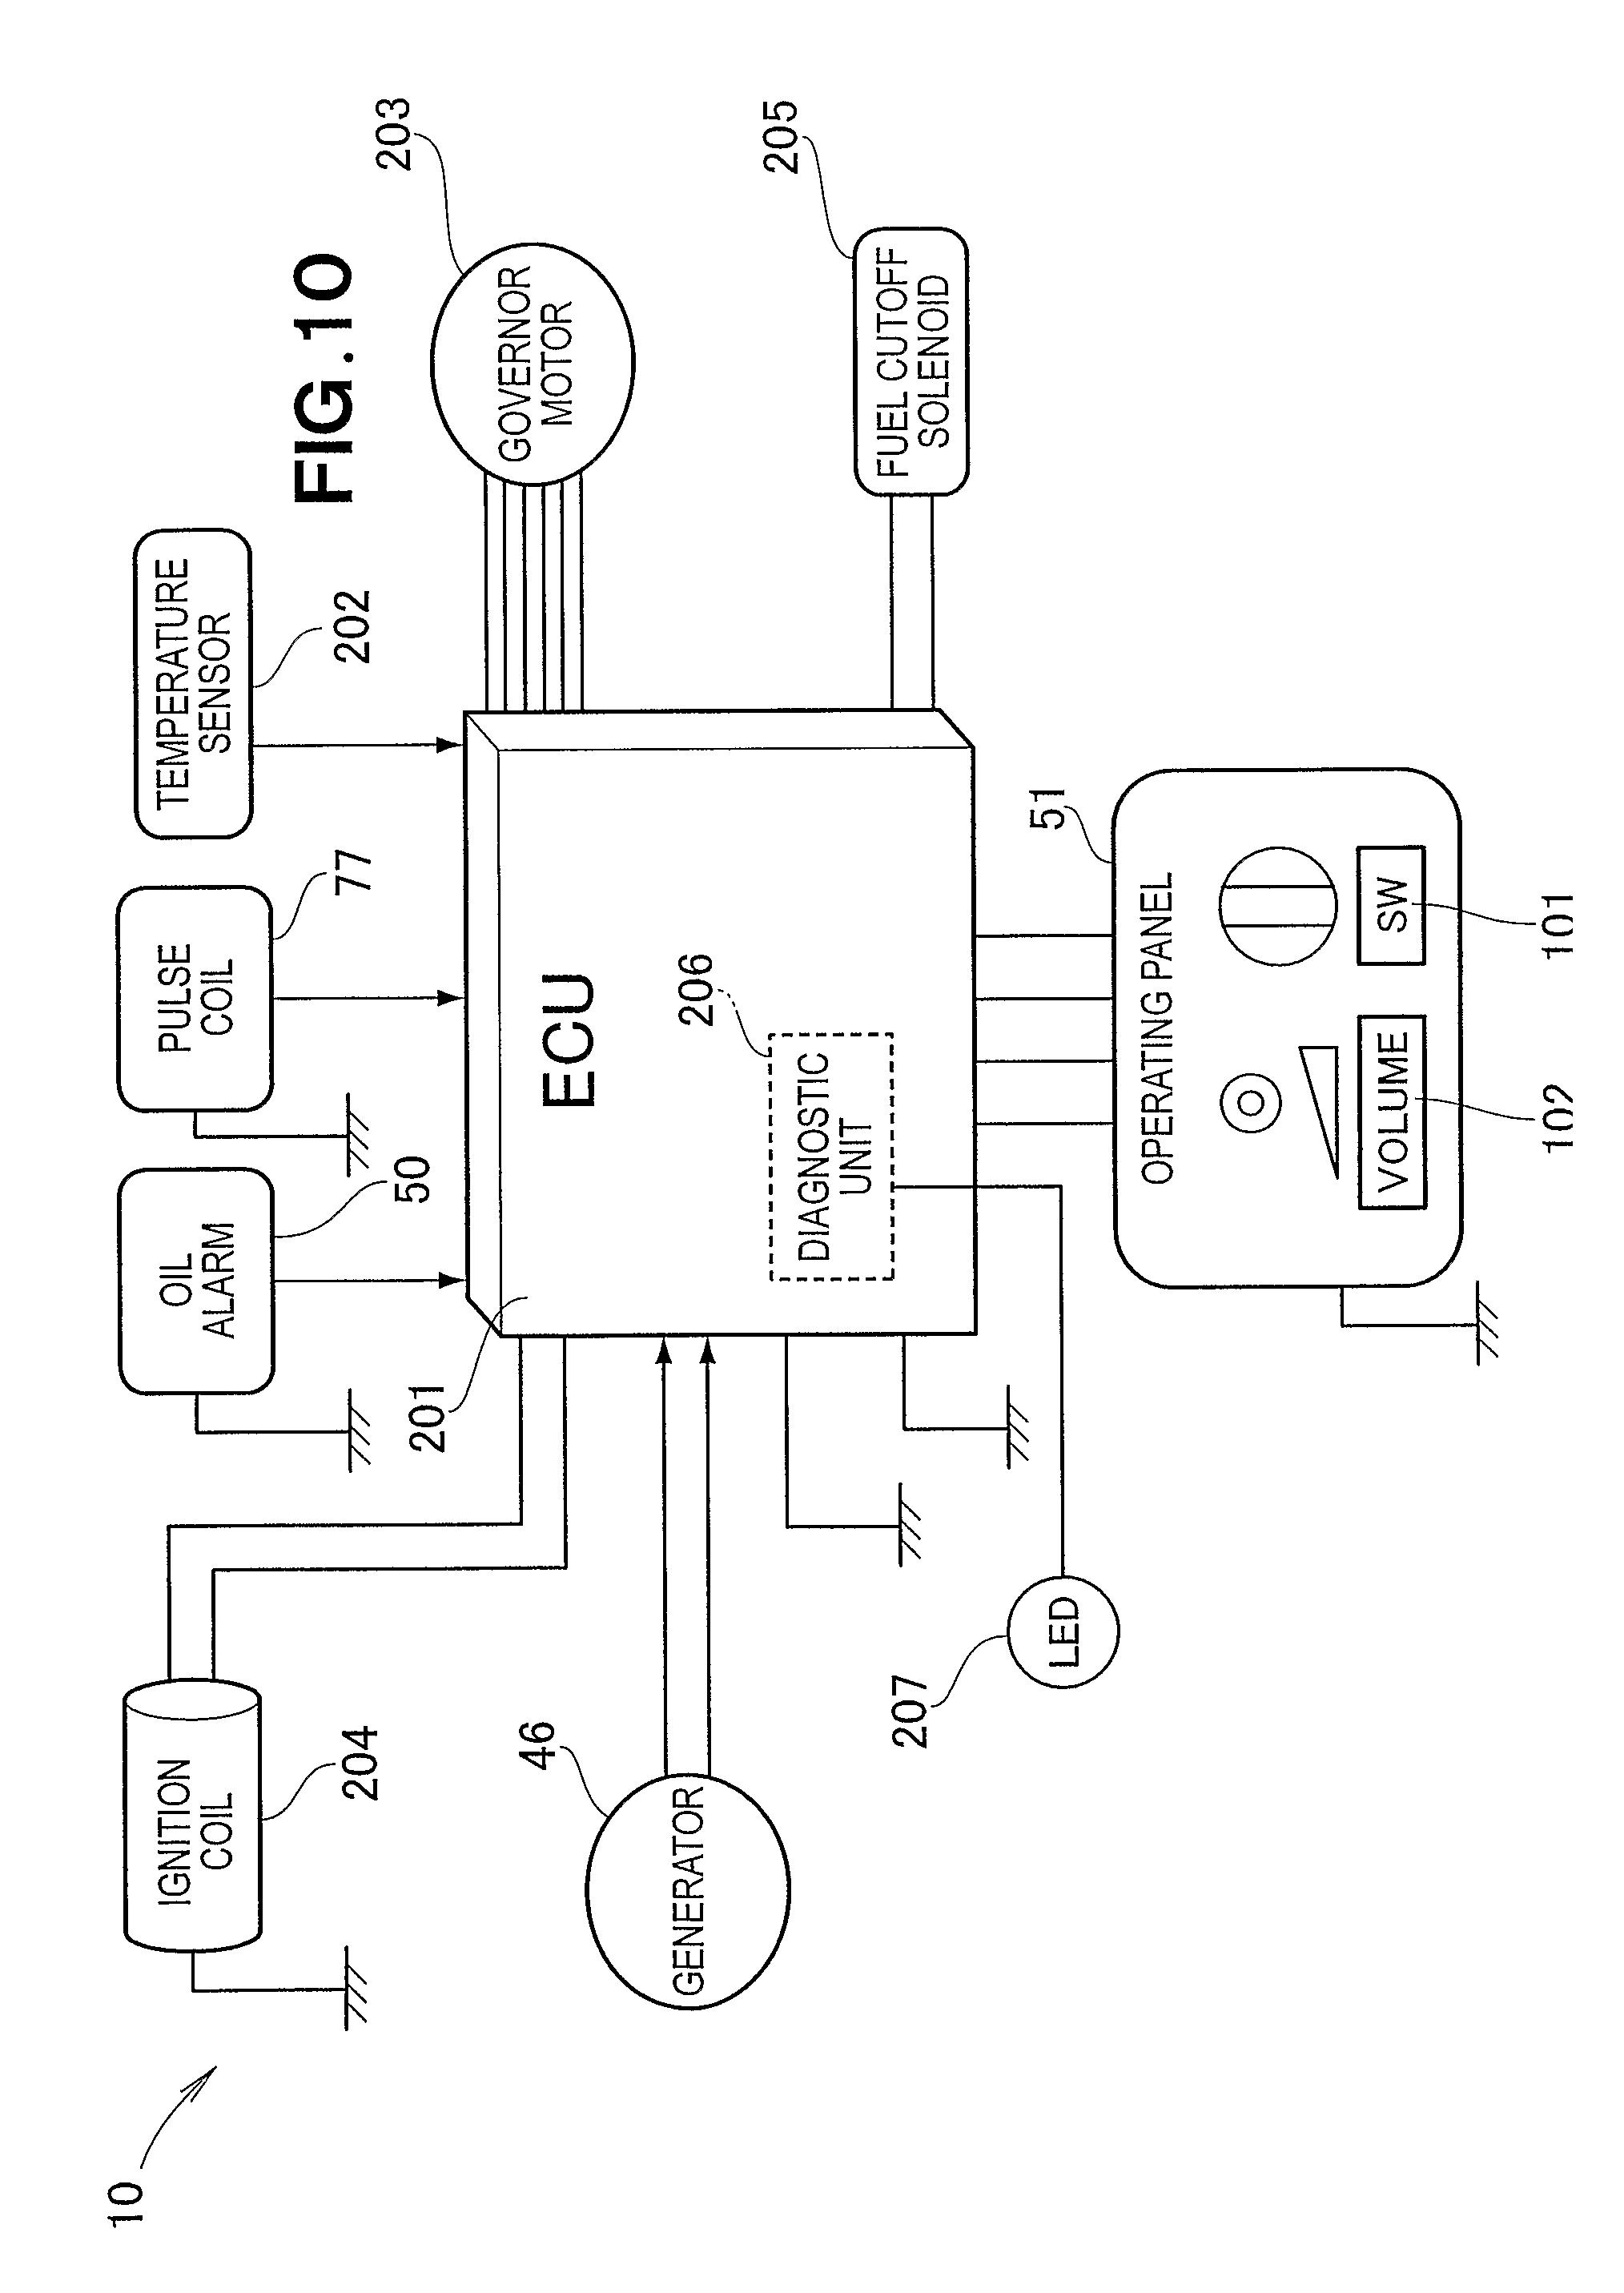 generator control panel wiring diagram 99 honda civic lx fuse box fg wilson 38